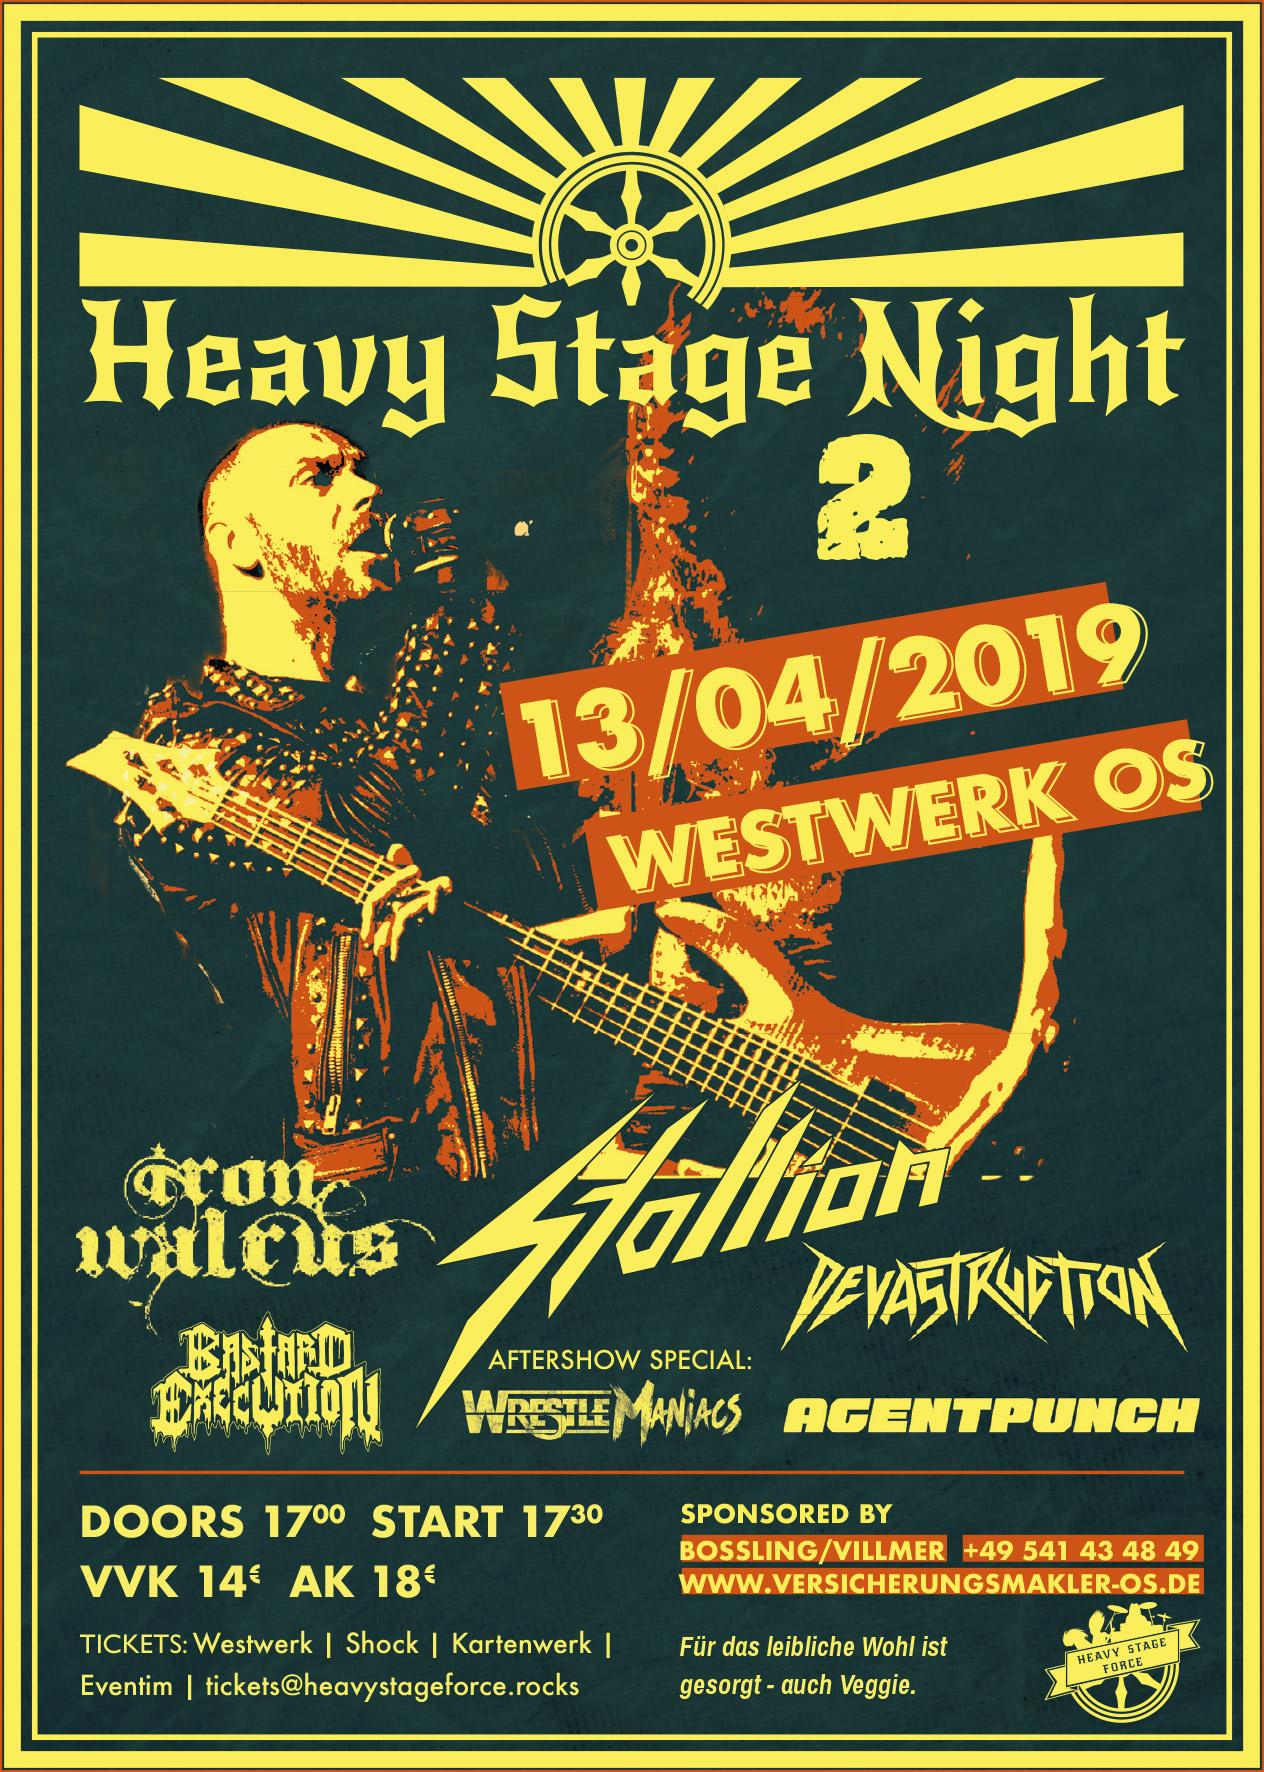 Heavy Stage Night 2